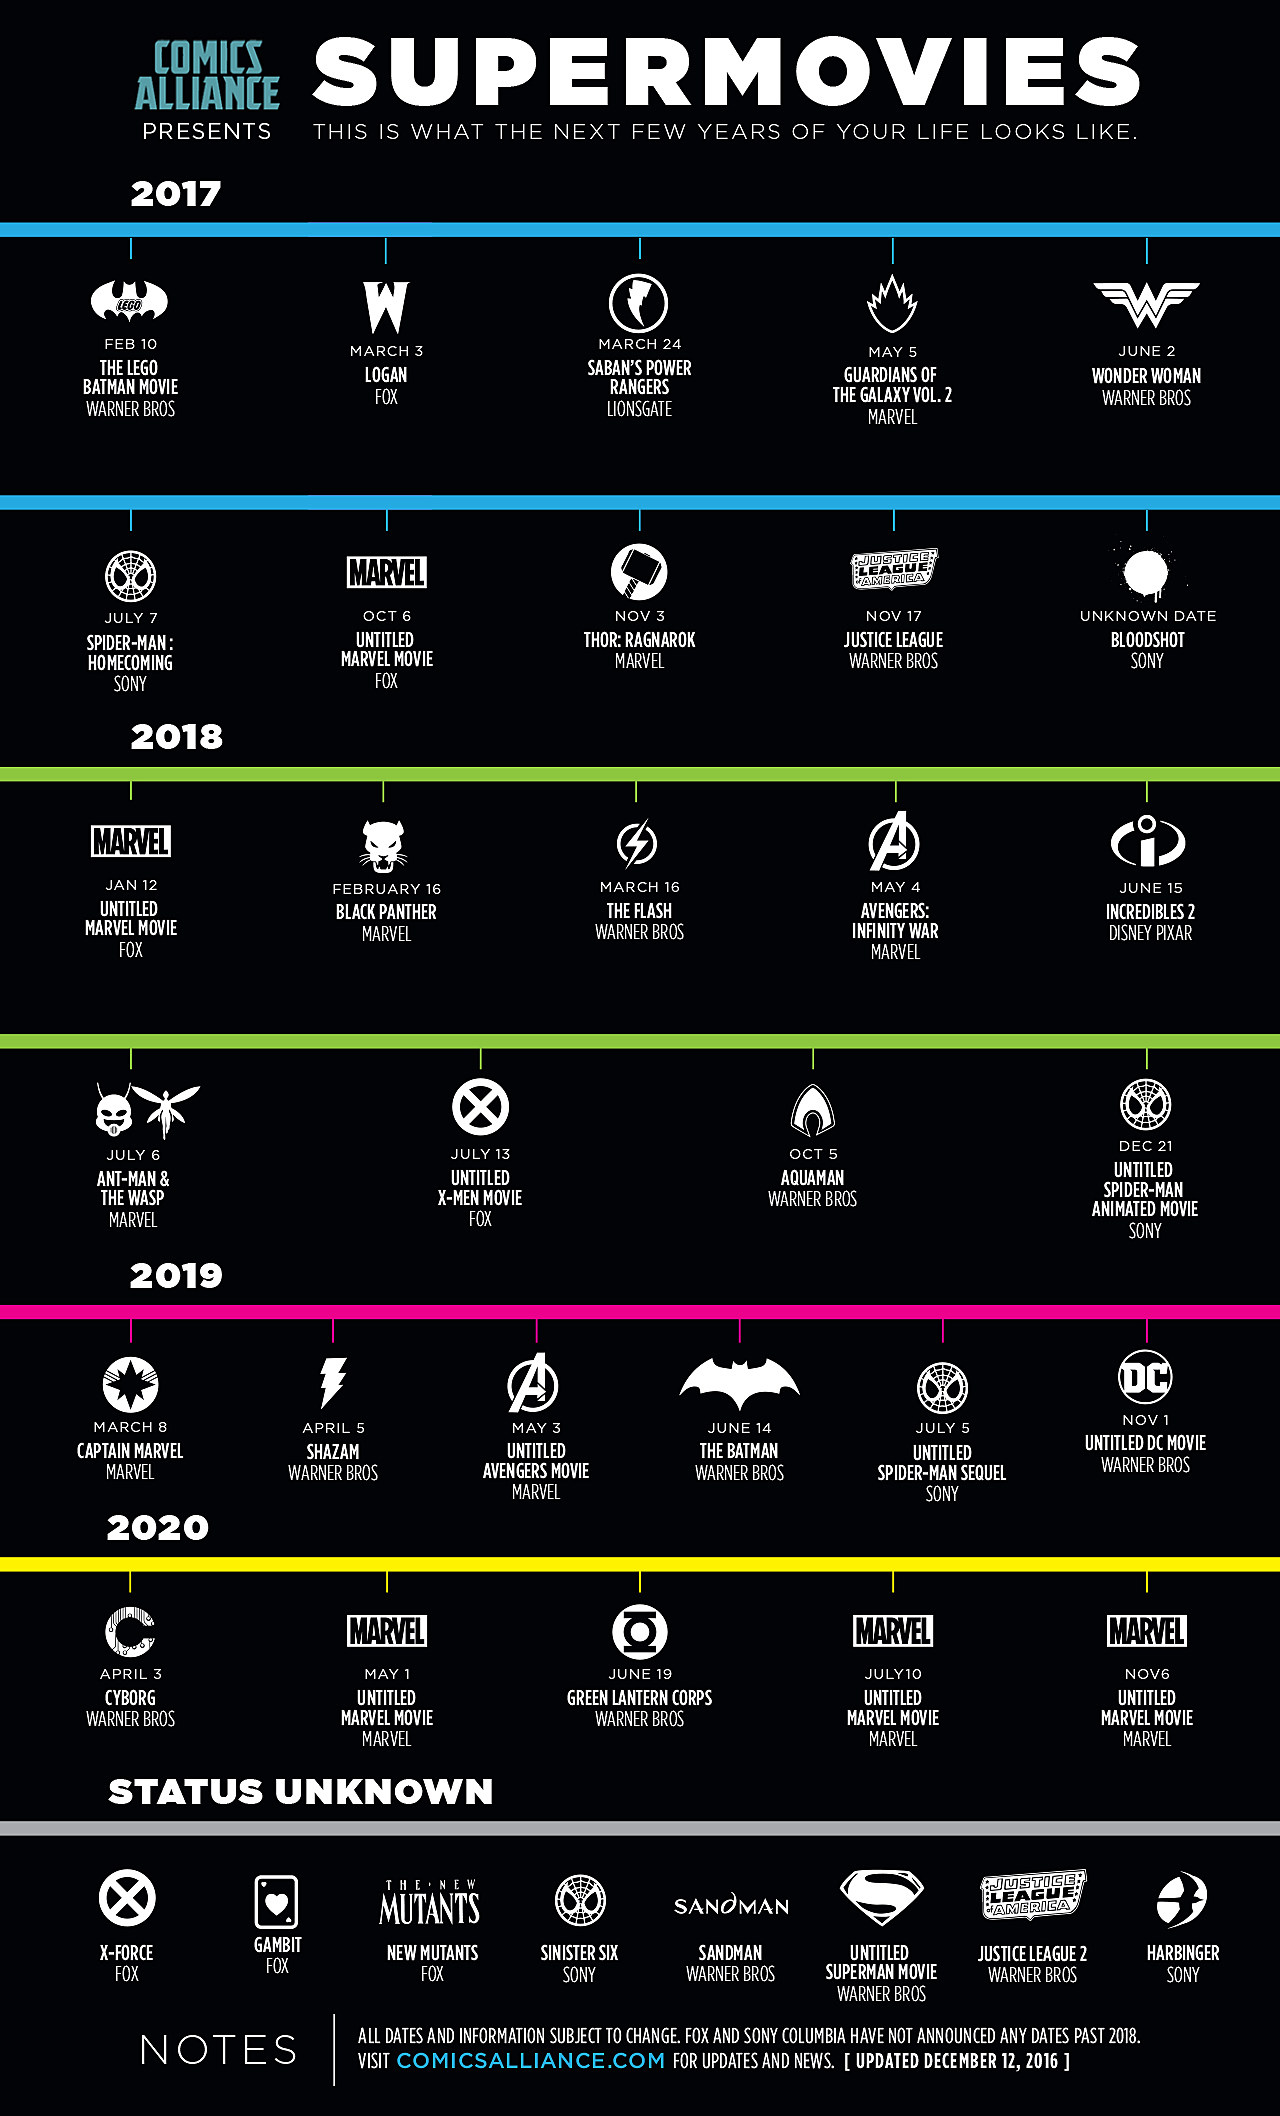 Comicsalliance Presents The Supermovies Infographic